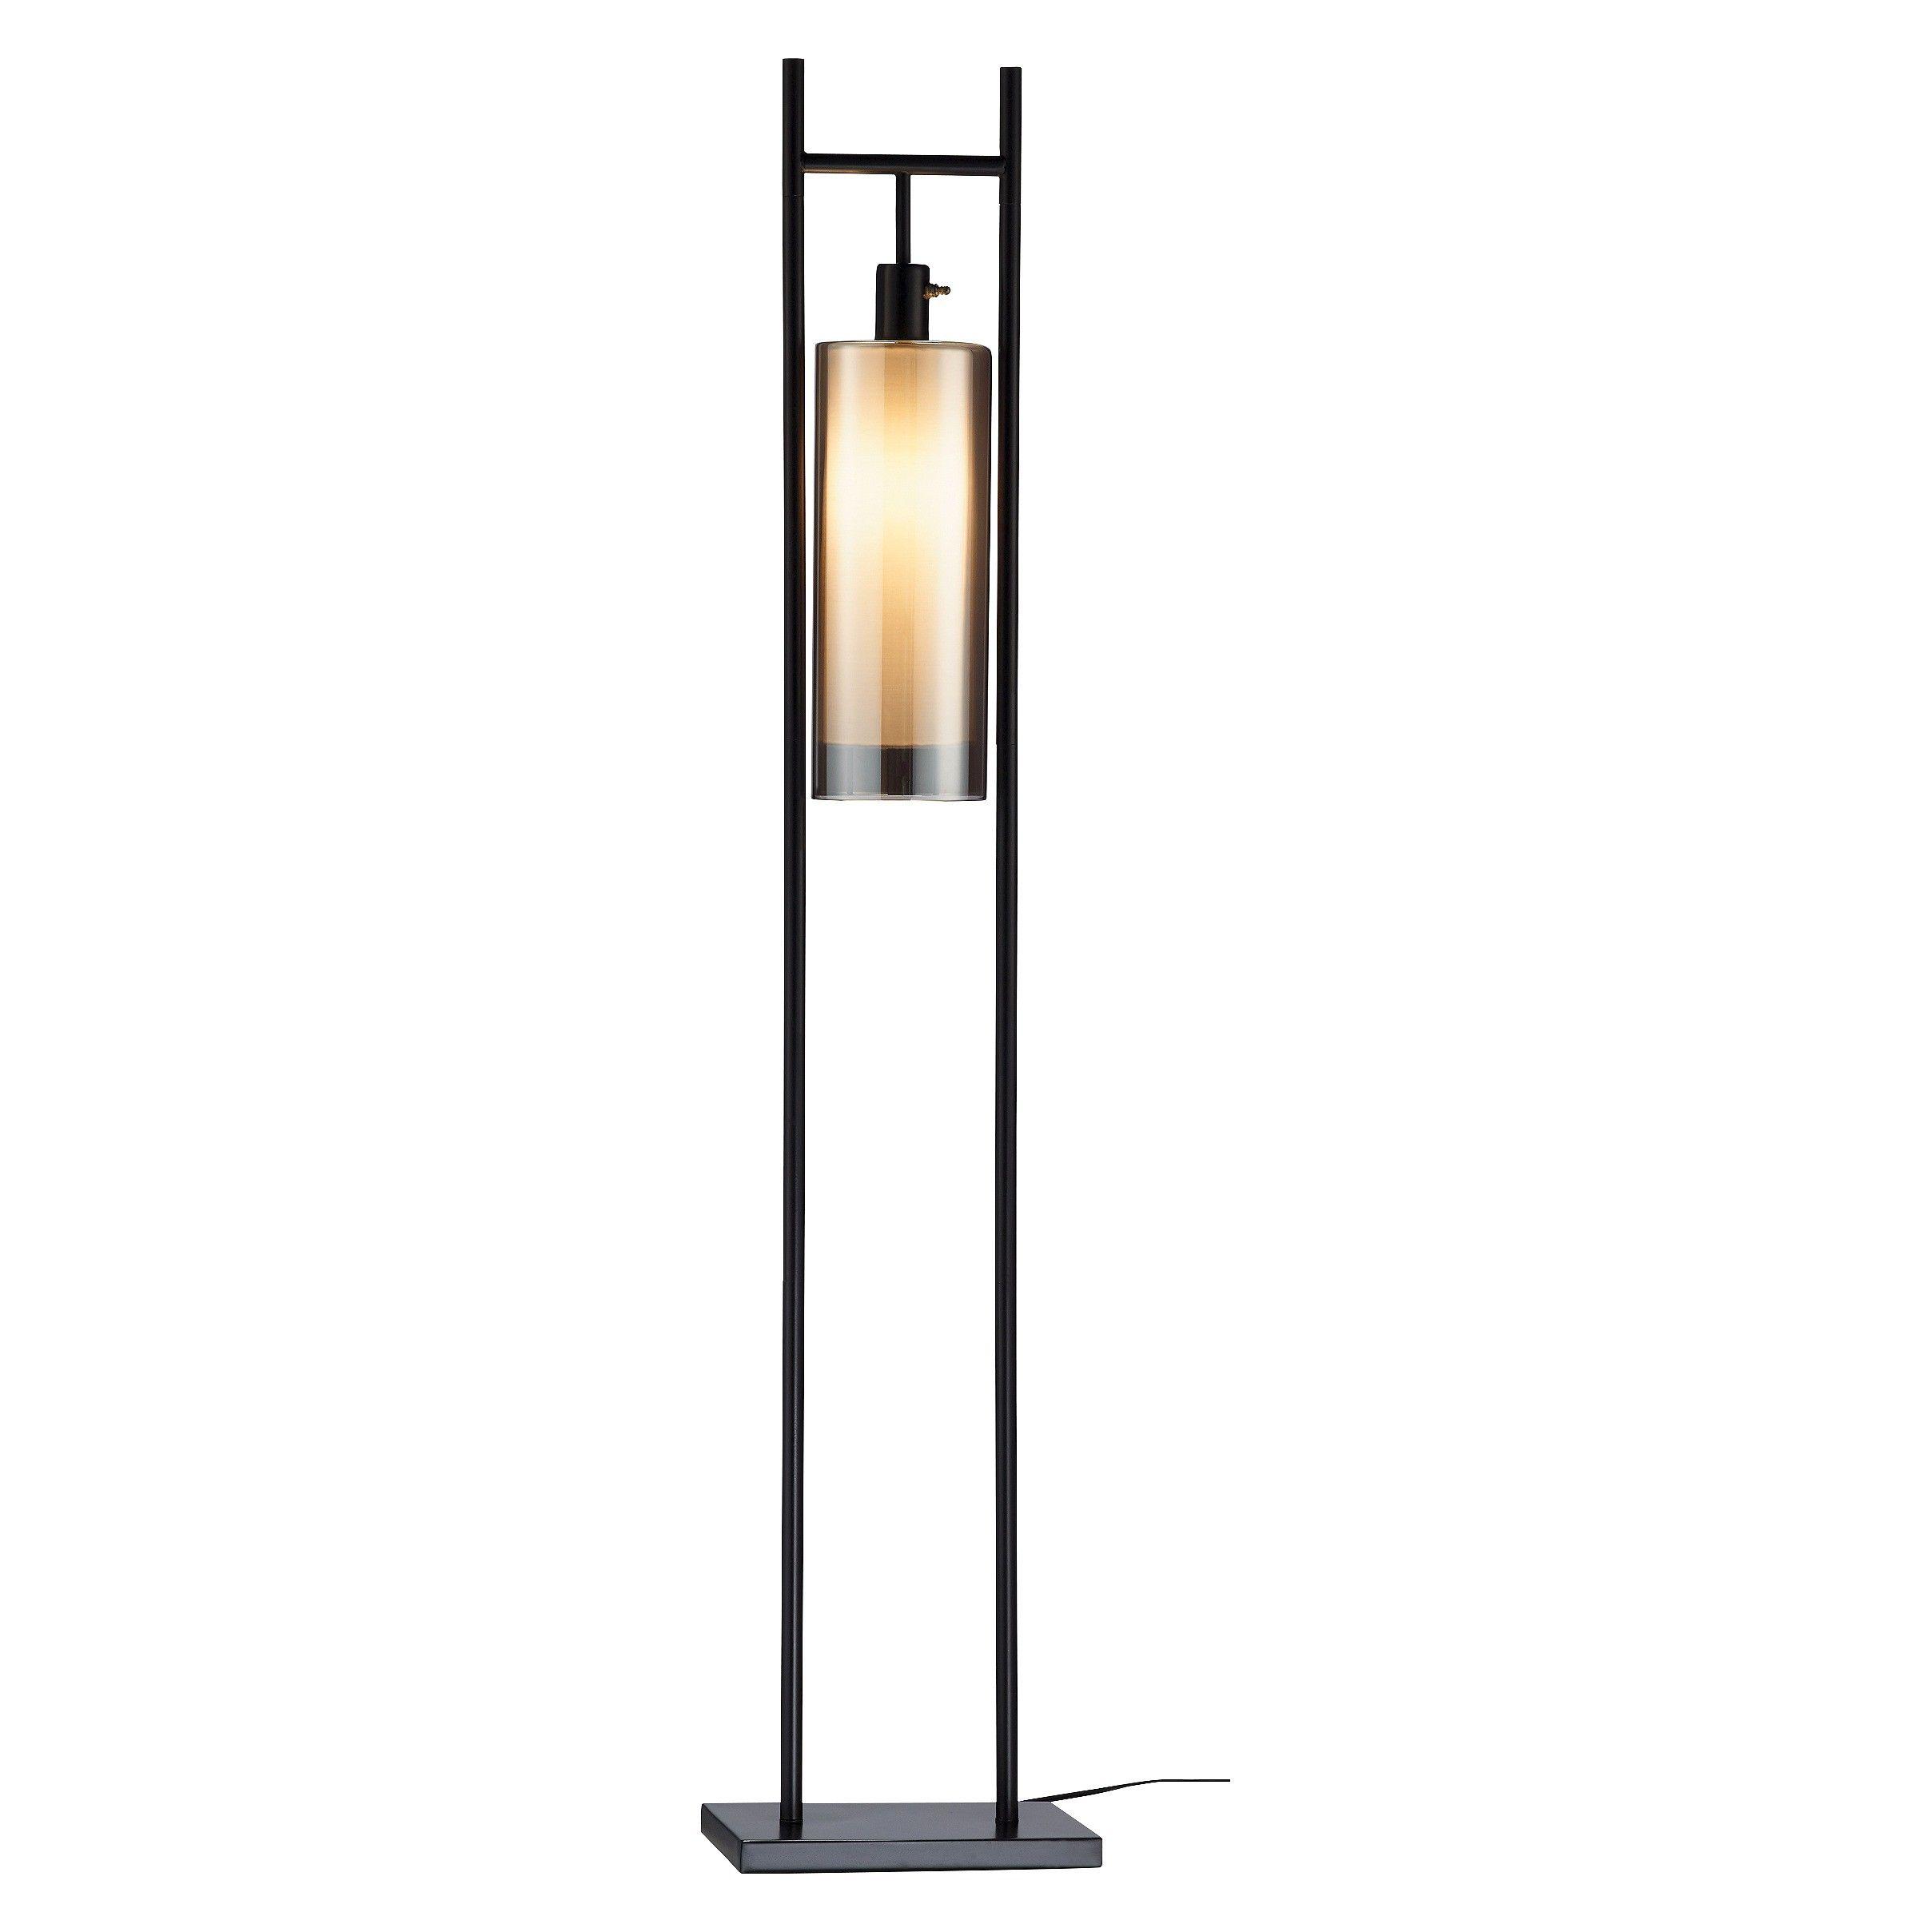 Adesso Revere Floor Lantern Black Target Floor lamp